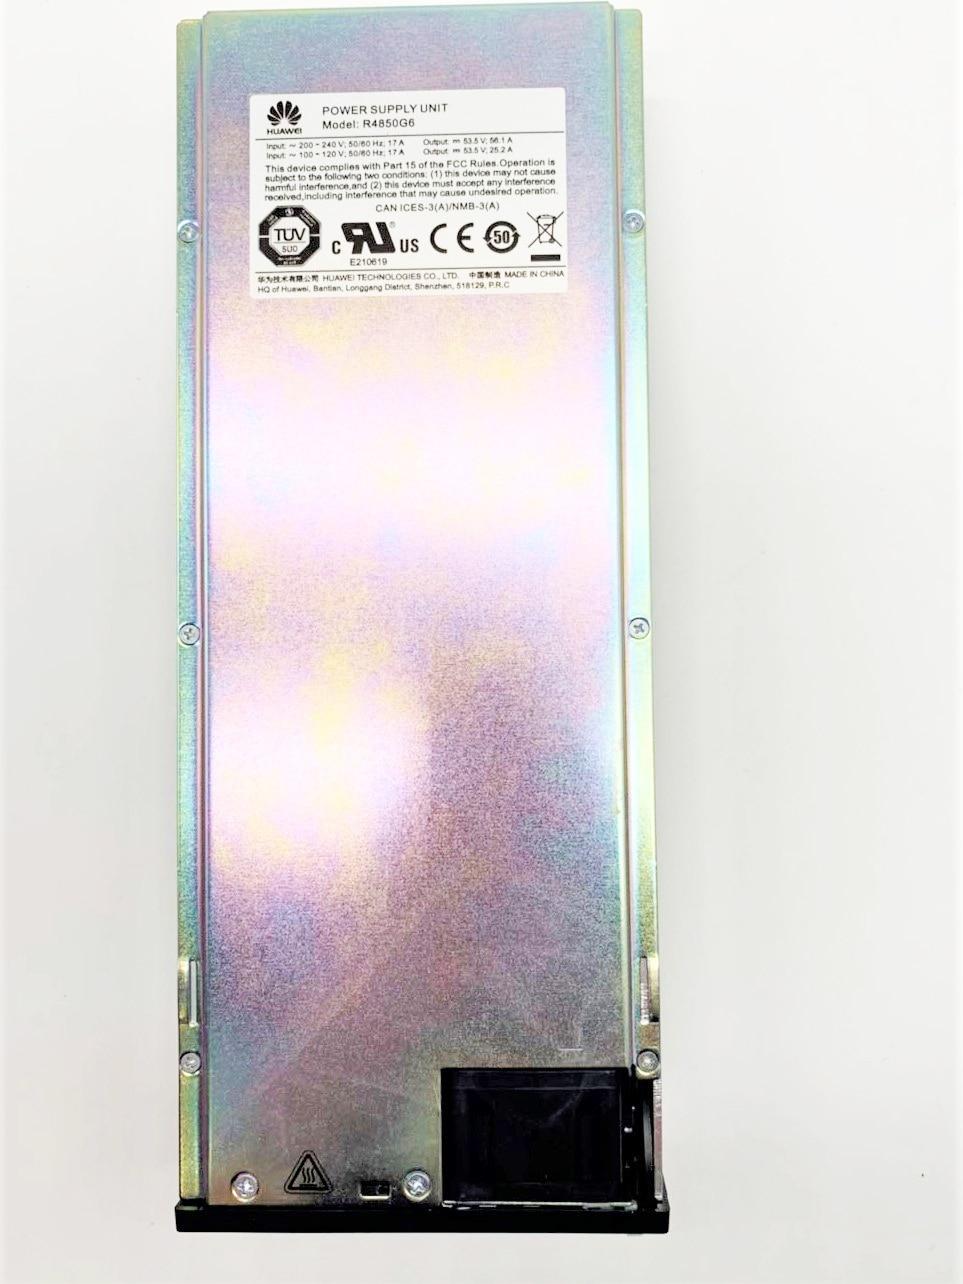 R4850 NEW POWER SUPPLY R4850G6 1U 3000W High Efficiency Rectifier for HUAWEI ETP48100-B1 power module for MA5680T 48V50A originaR4850 NEW POWER SUPPLY R4850G6 1U 3000W High Efficiency Rectifier for HUAWEI ETP48100-B1 power module for MA5680T 48V50A origina